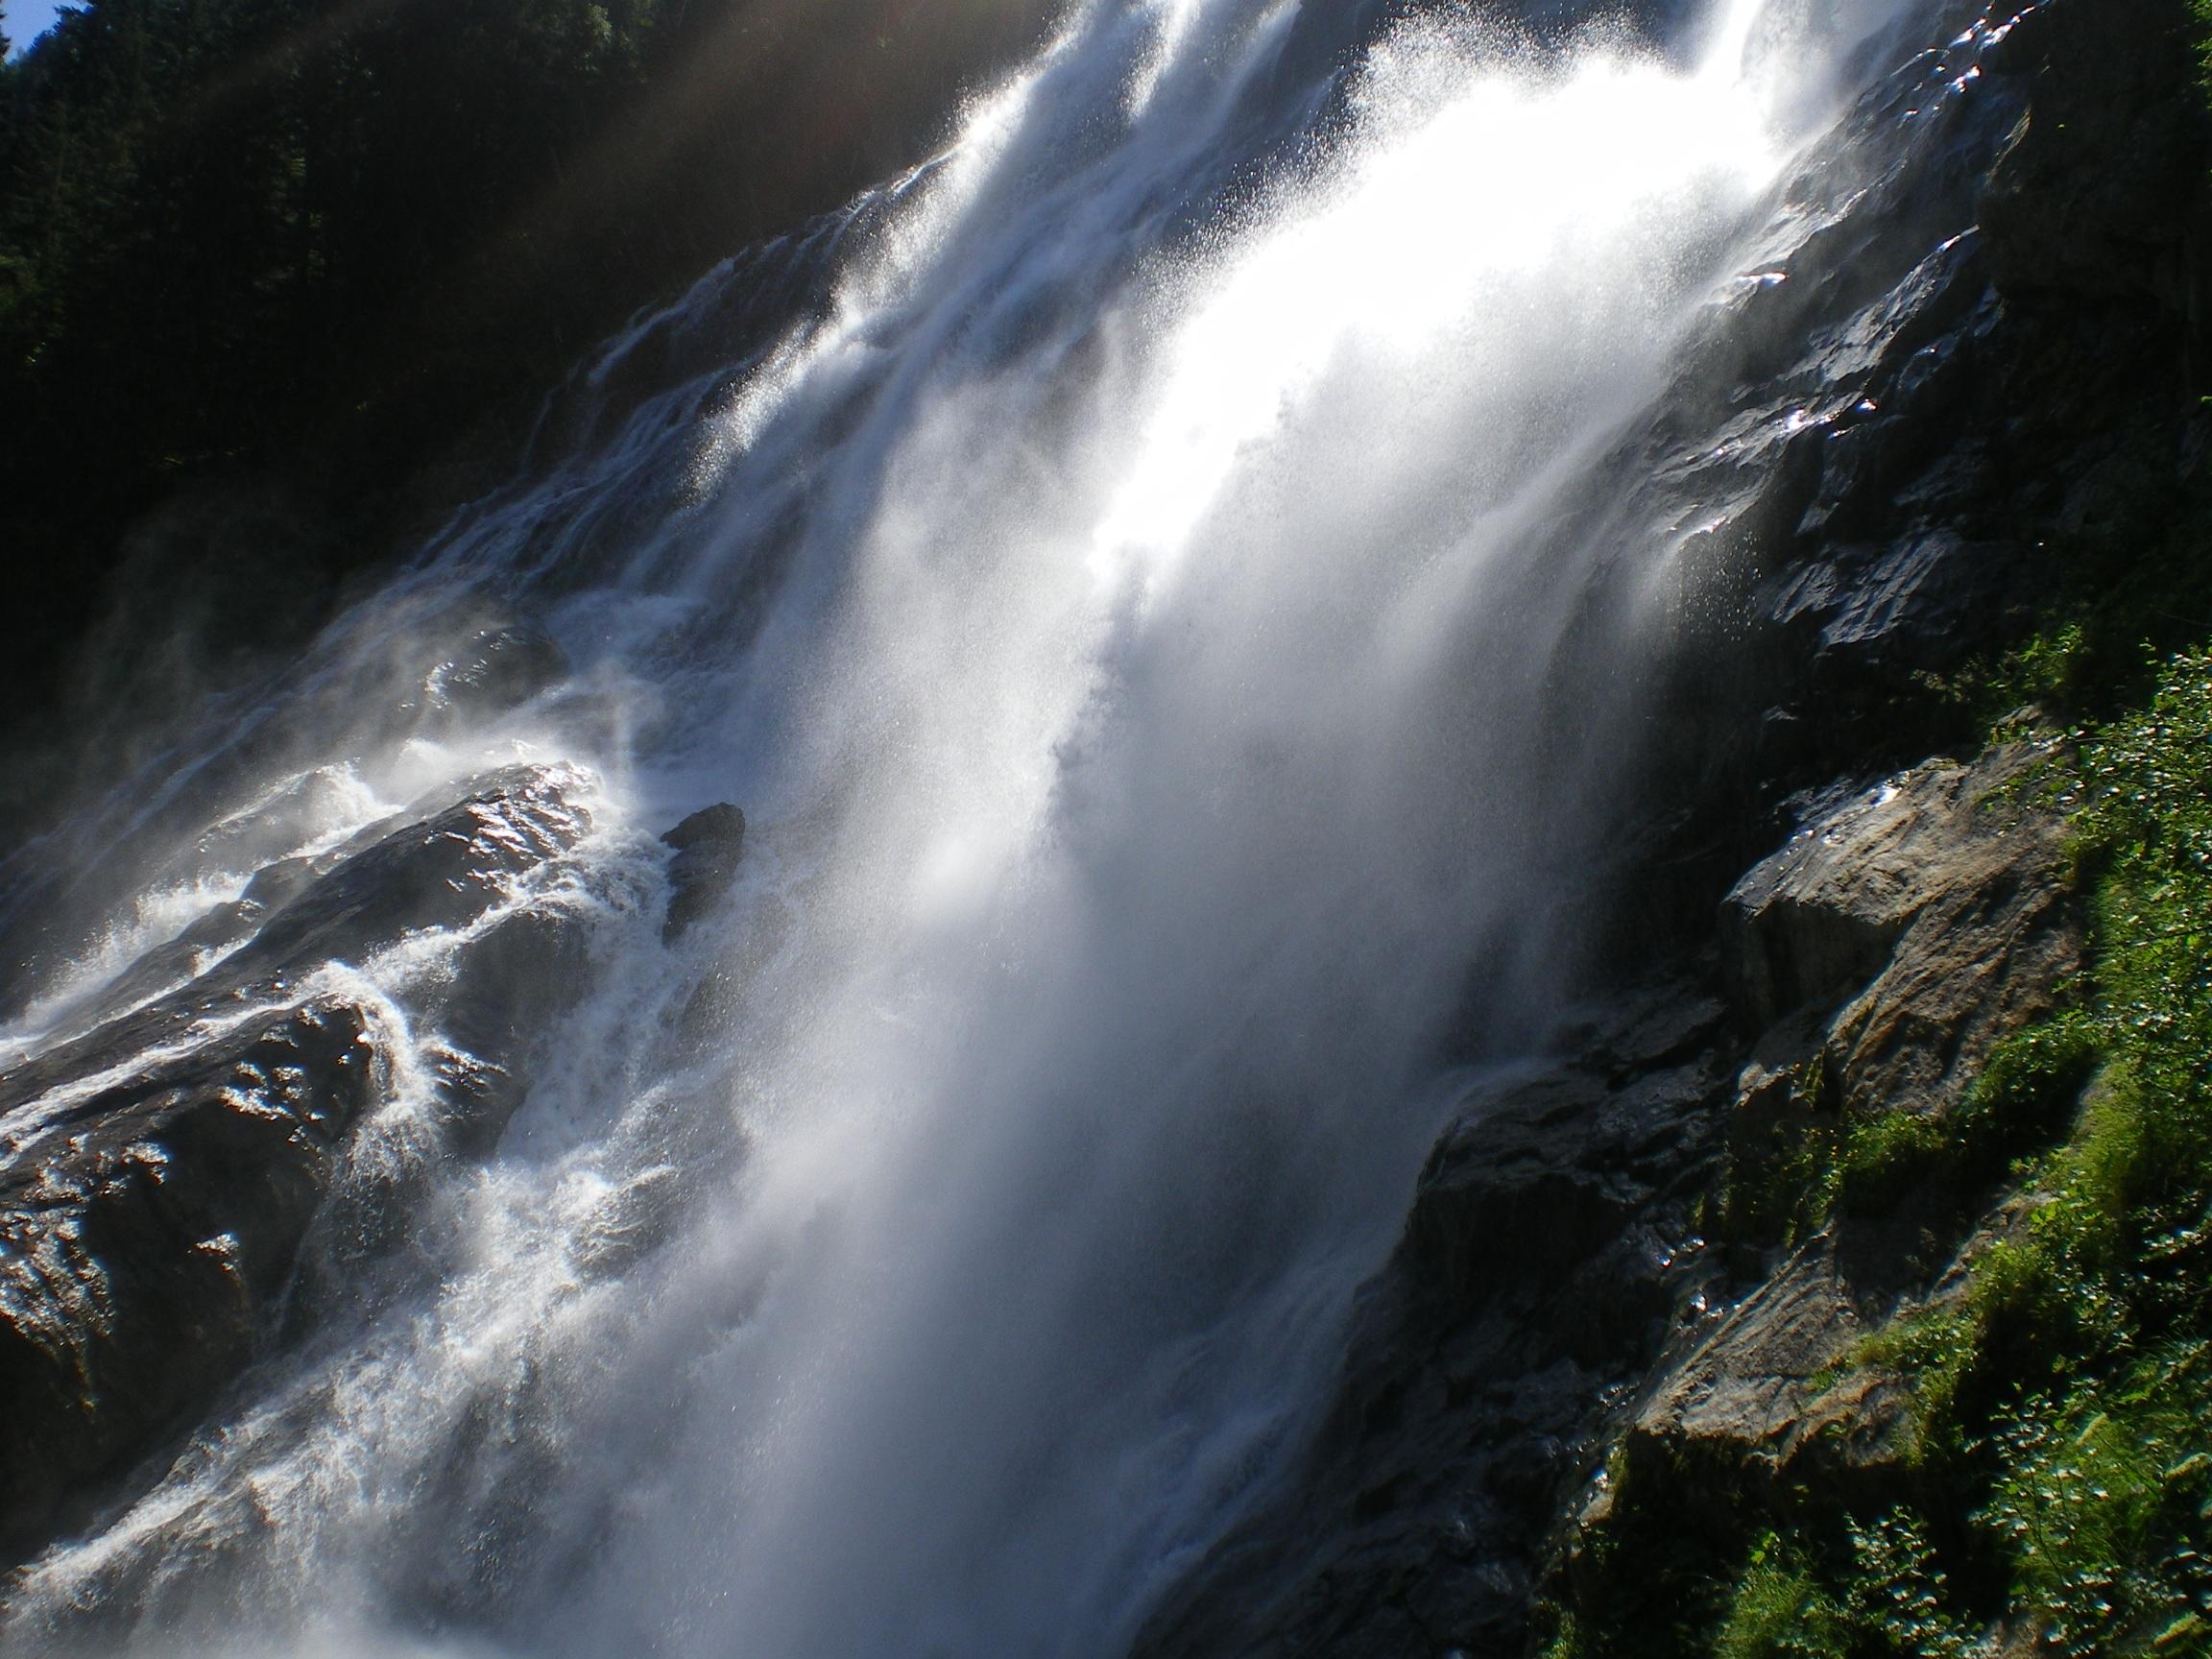 бушующий водопад в картинках россии наоборот